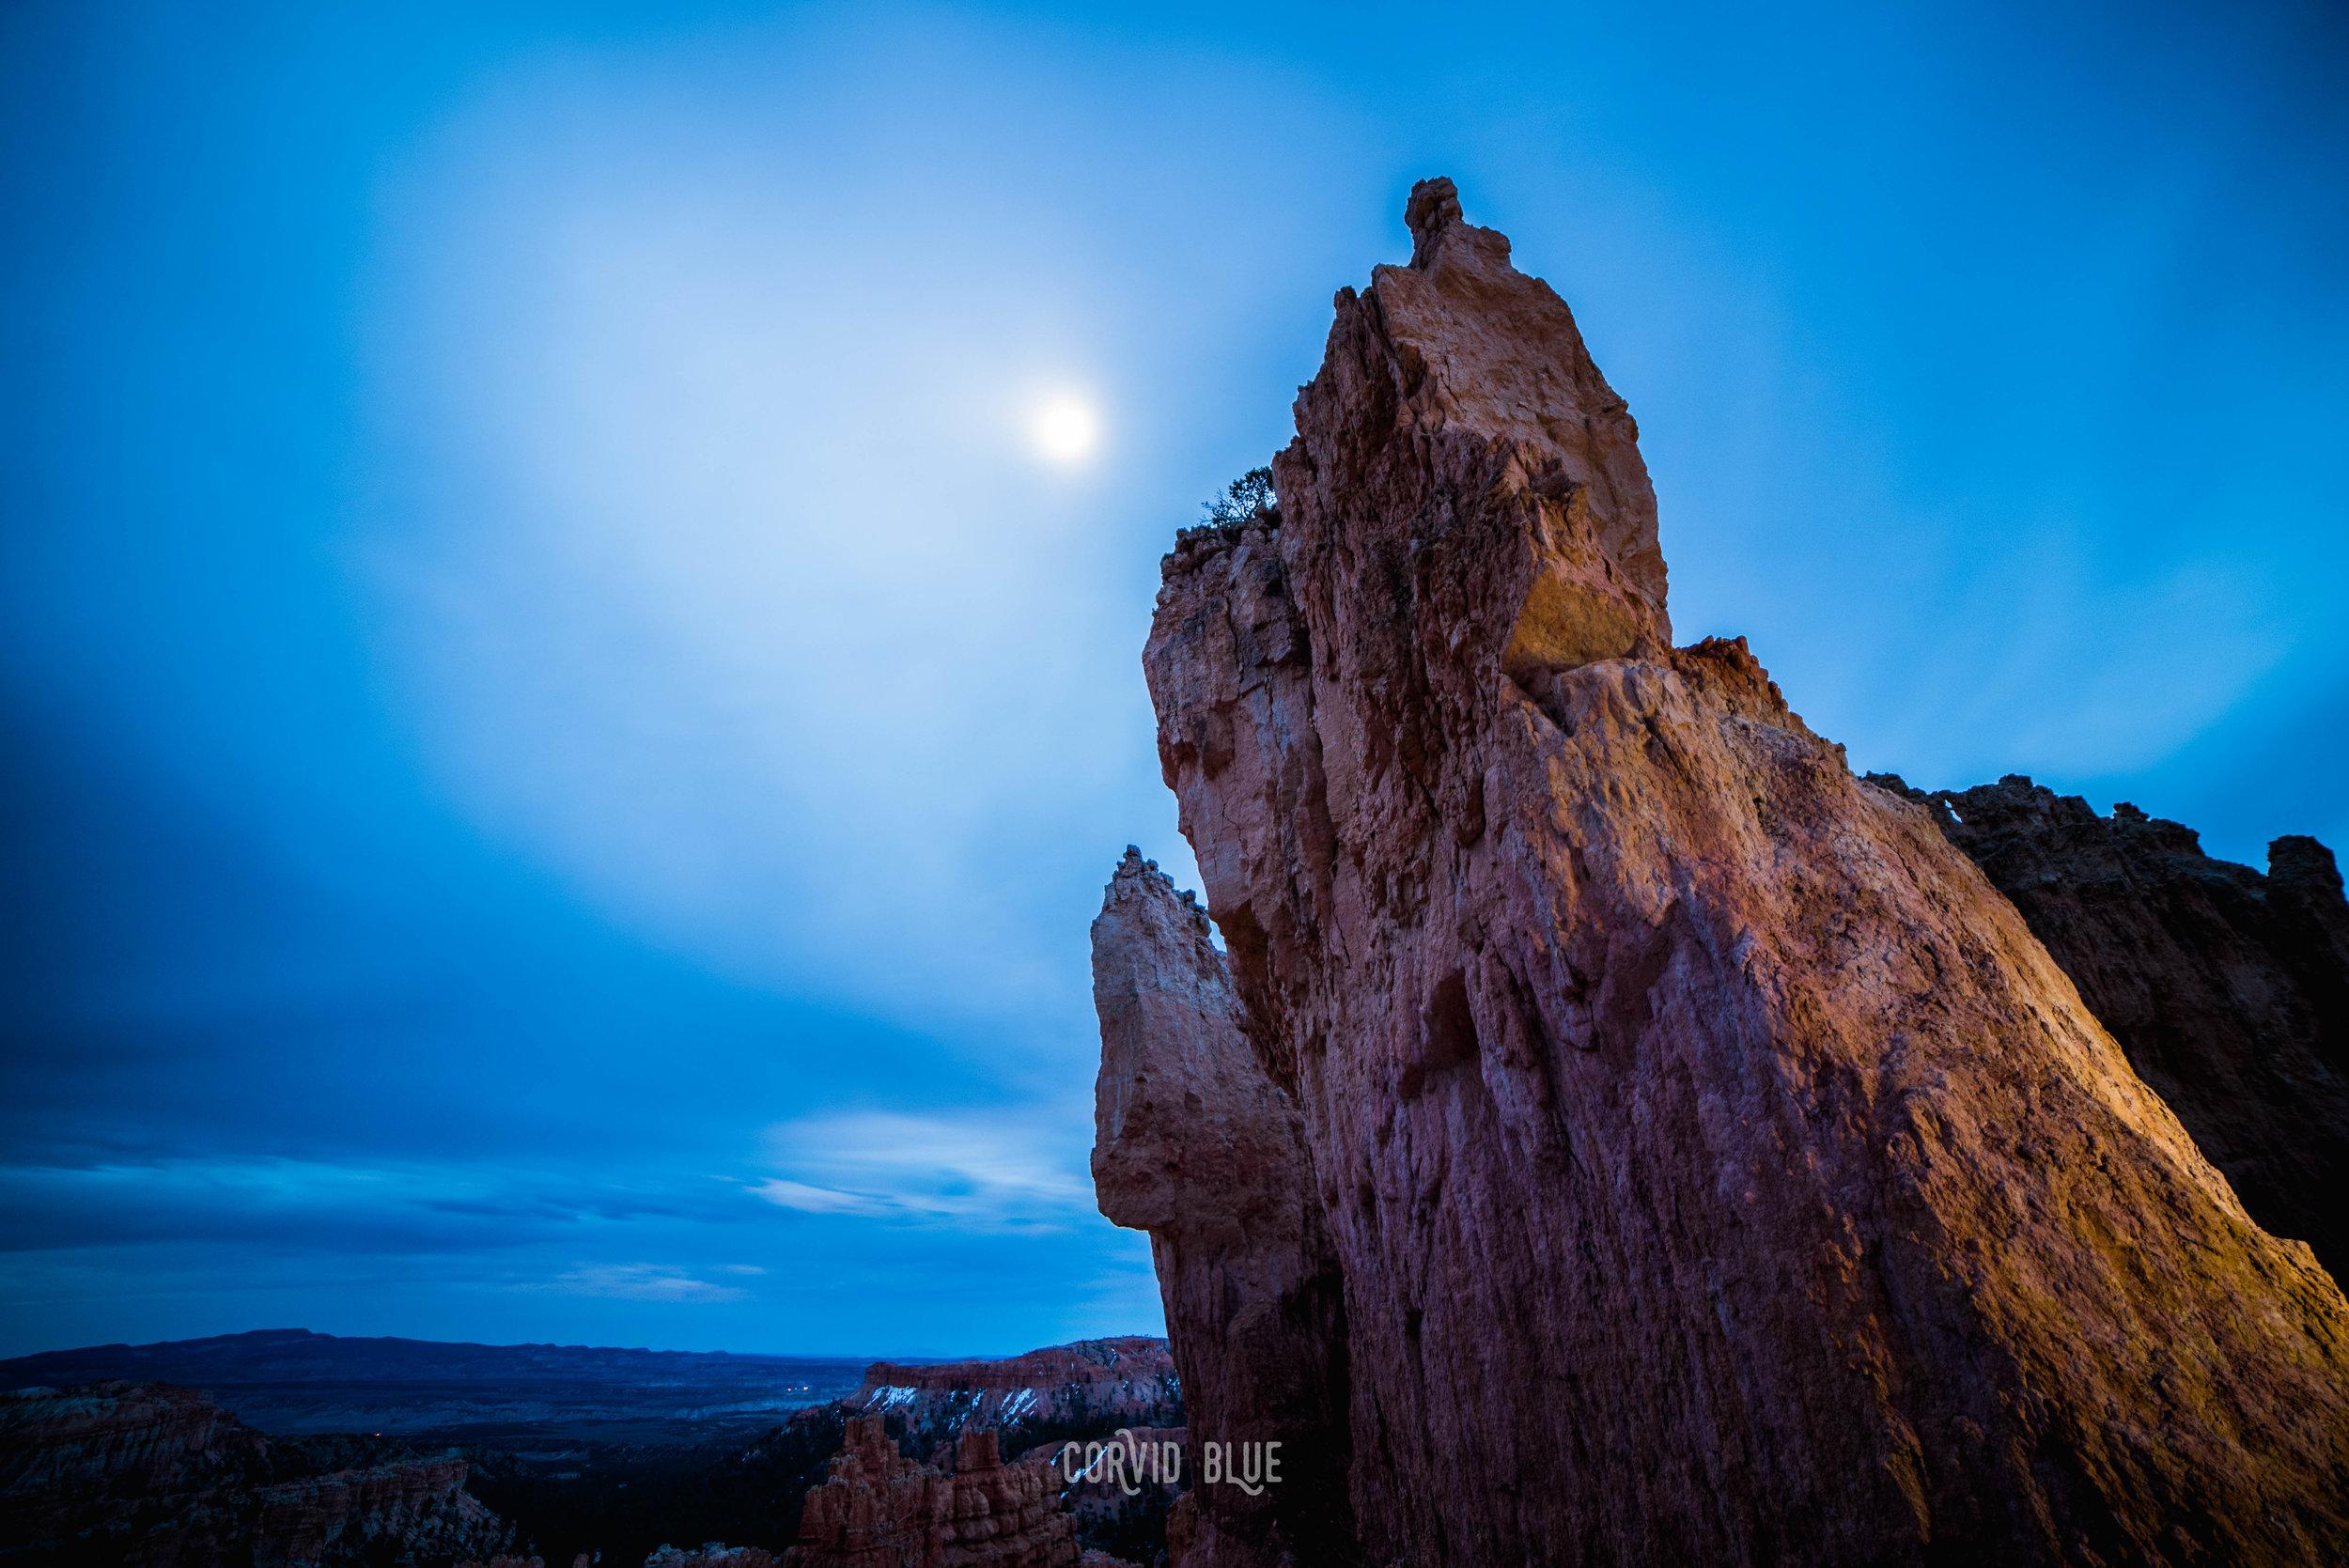 bryce-canyon-national-park_34097638101_o.jpg